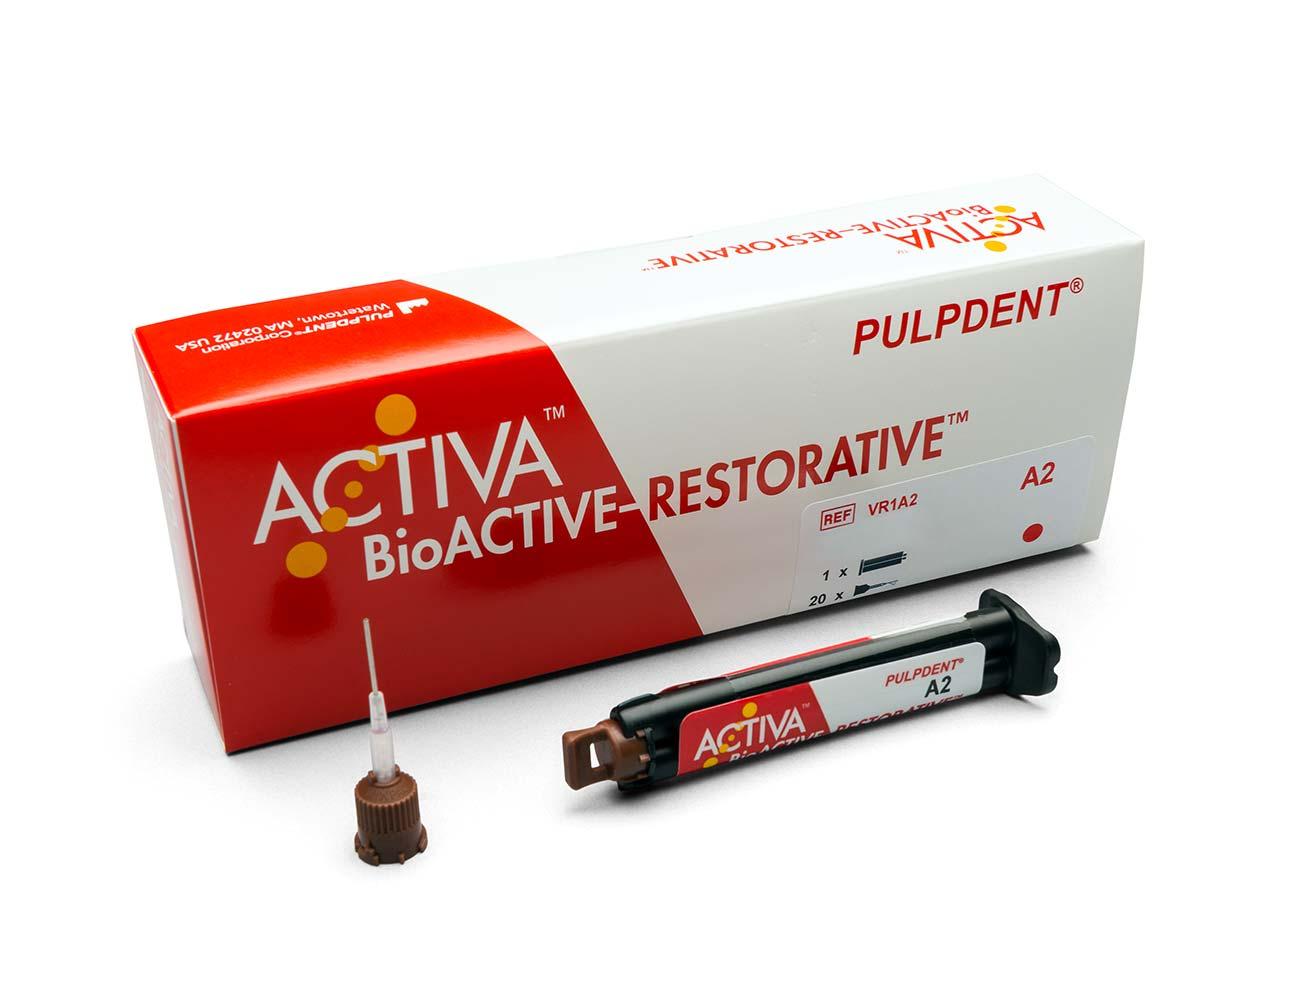 Applicator for ACTIVA RESTORATIVE